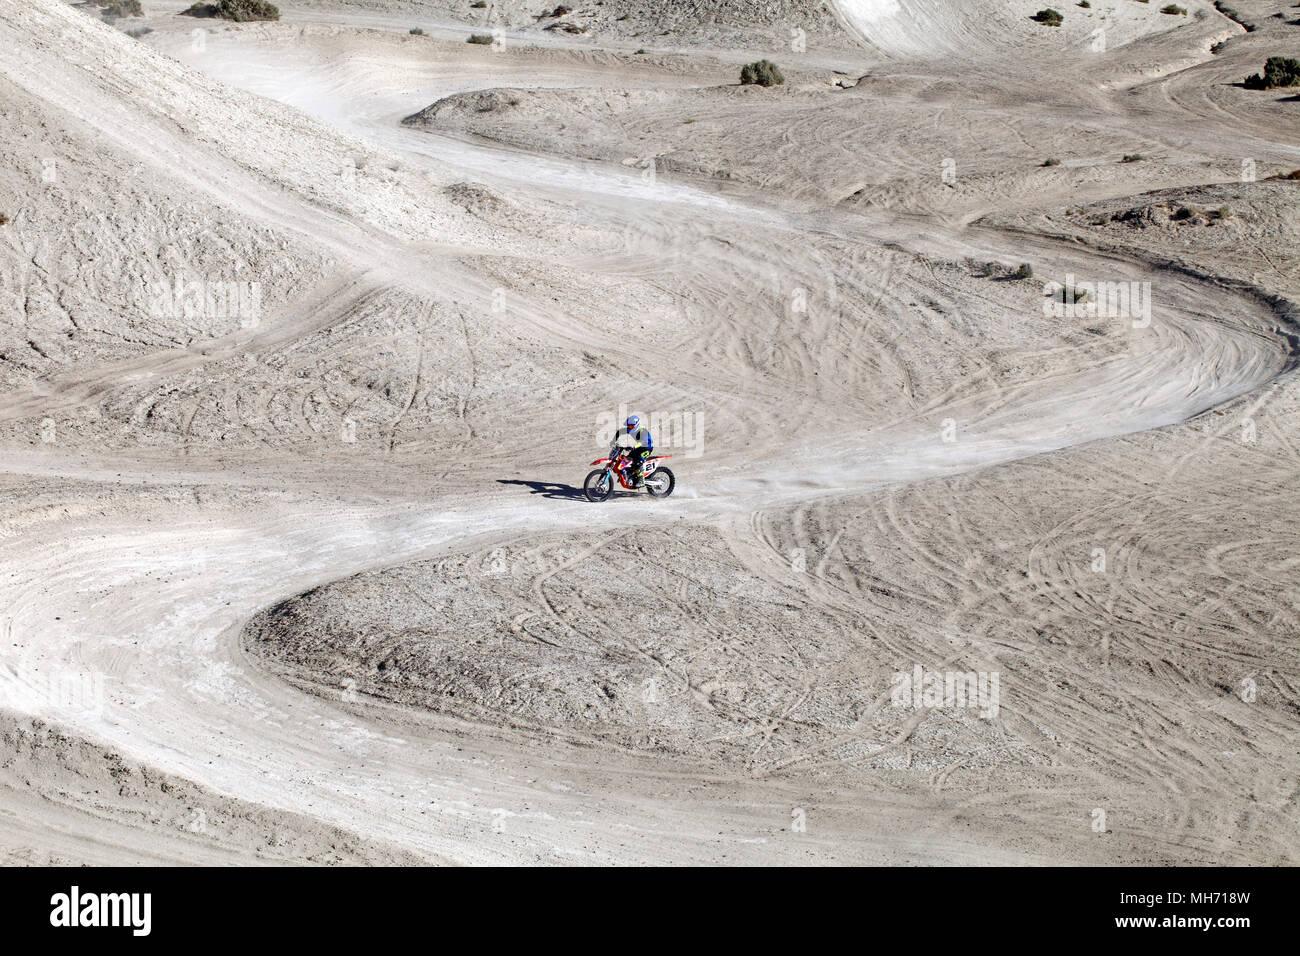 Off-road motorbike, enduro, scrambling, scramble, racetrack on the Sand dunes, near Punta Cuevas, Puerto Madryn. Chubut Argentina. - Stock Image